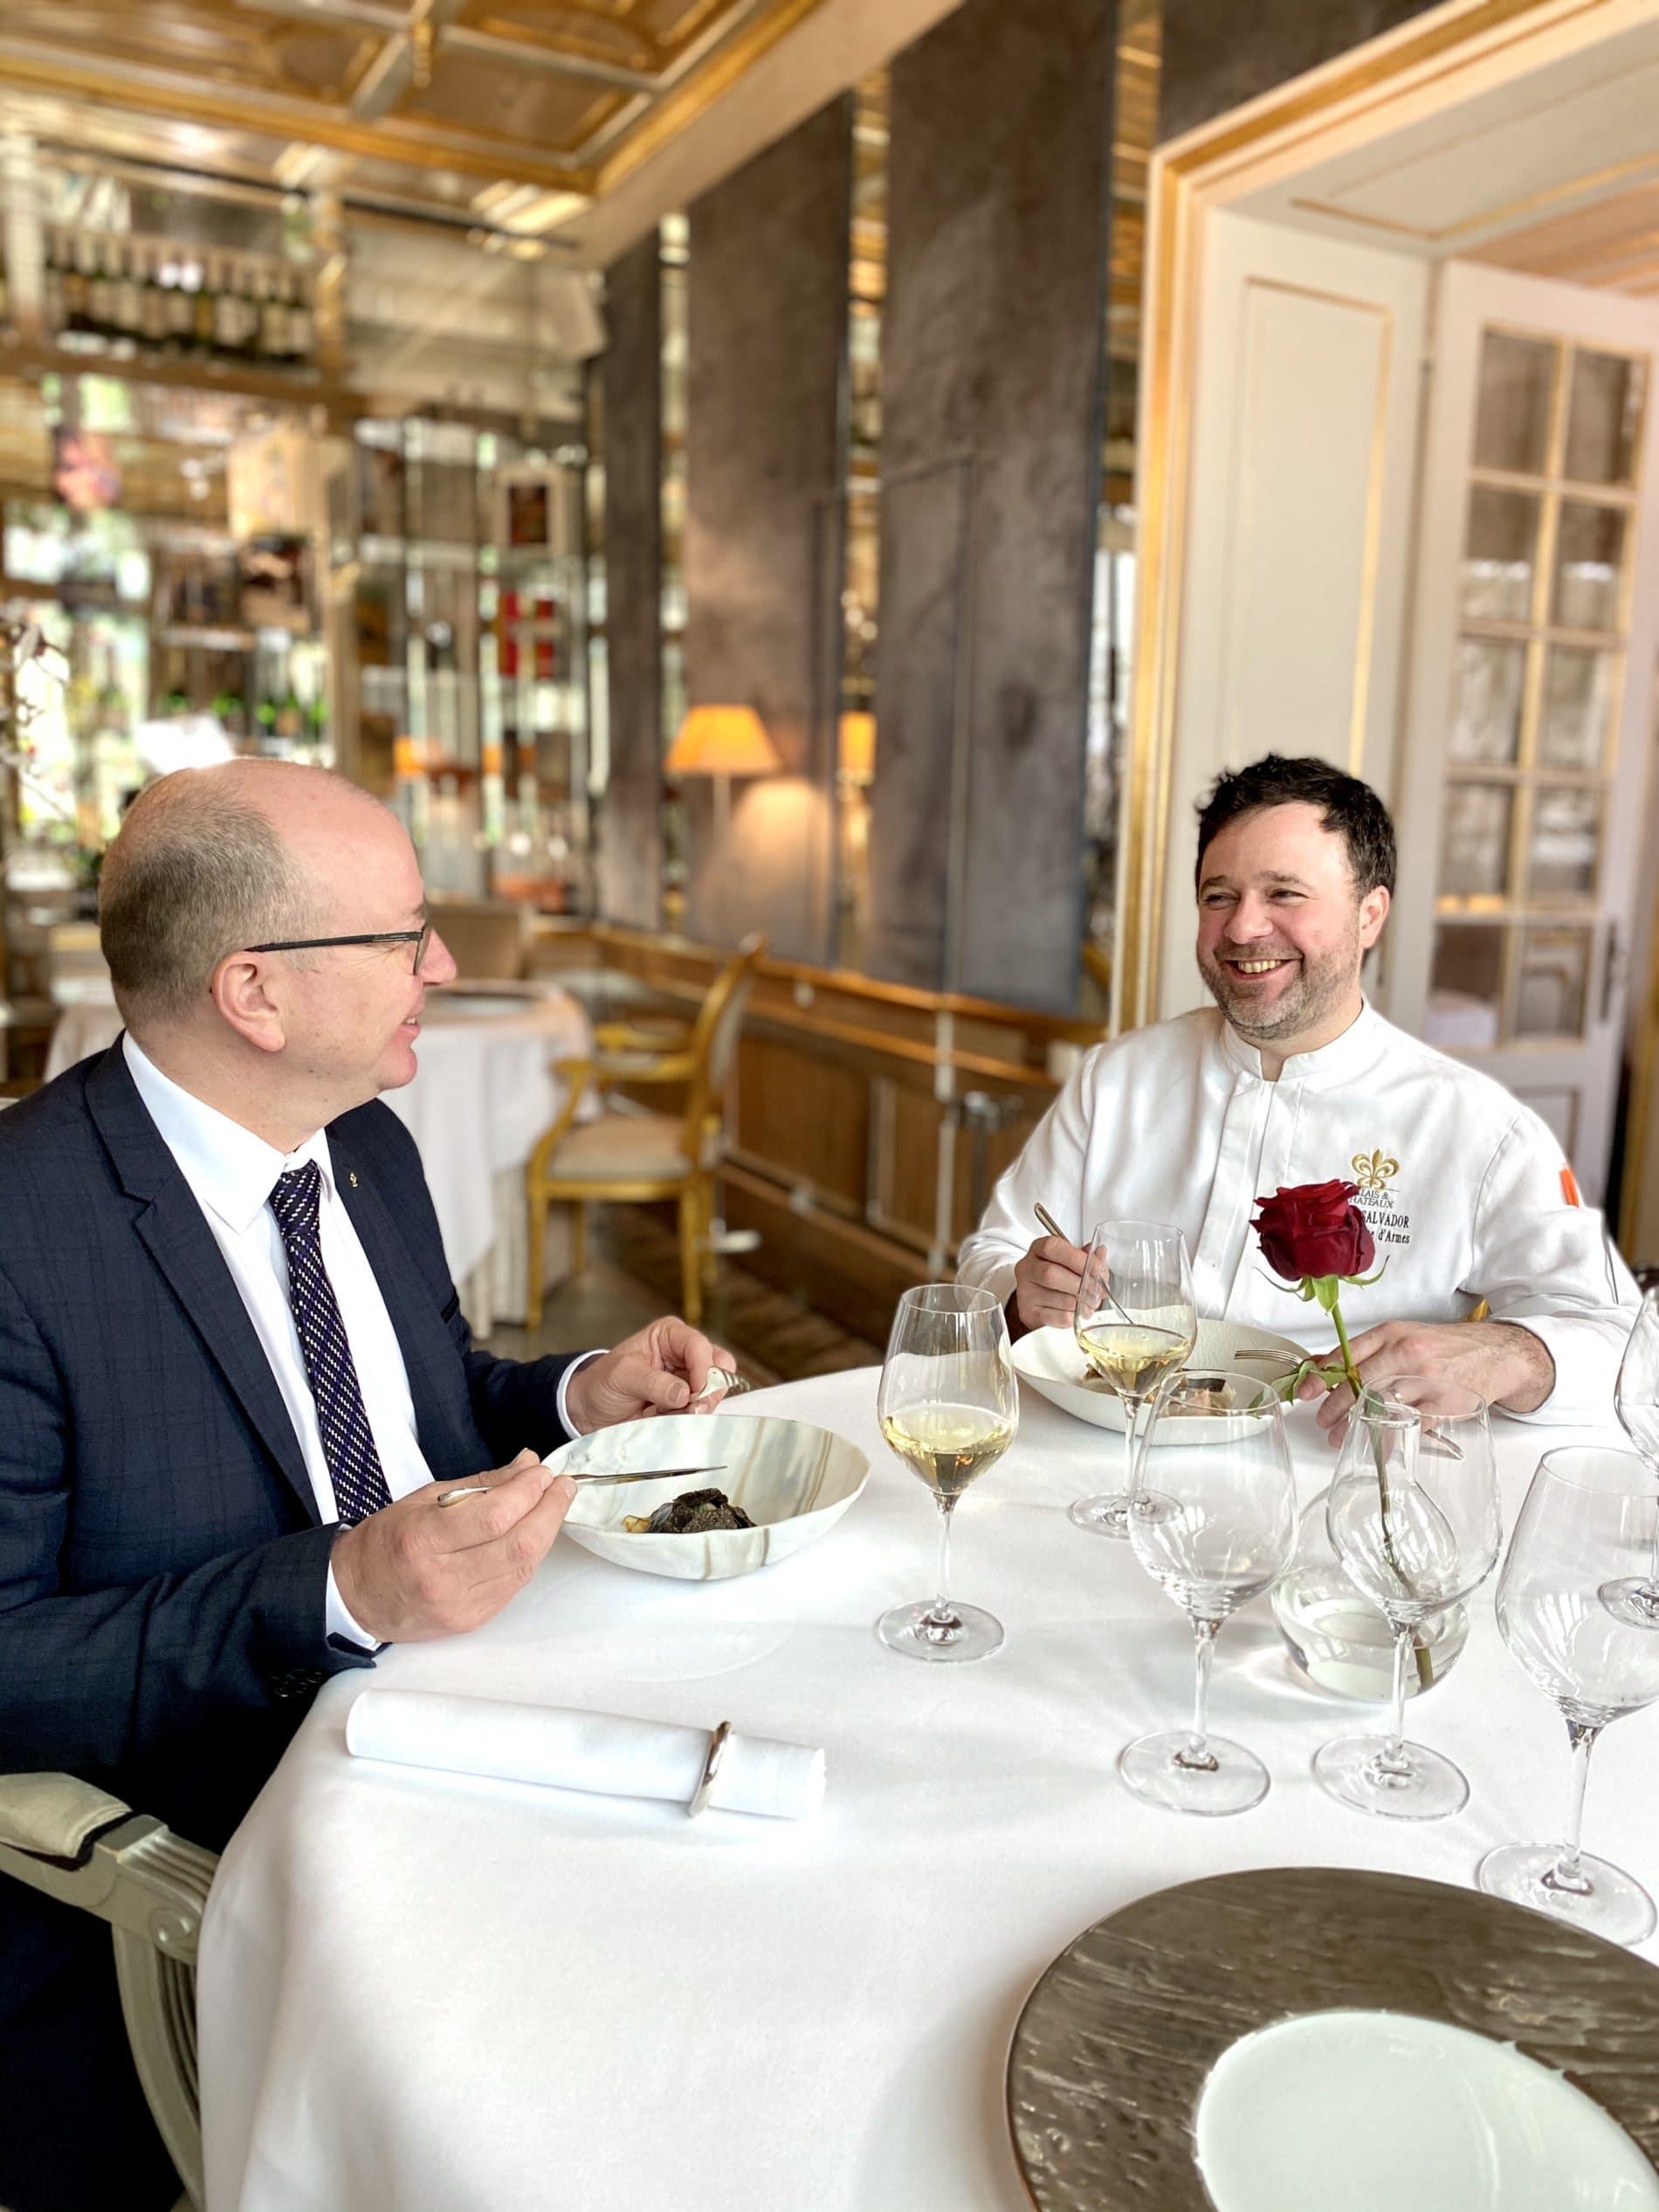 Un dîner avec le Chef Fabrice Salvador